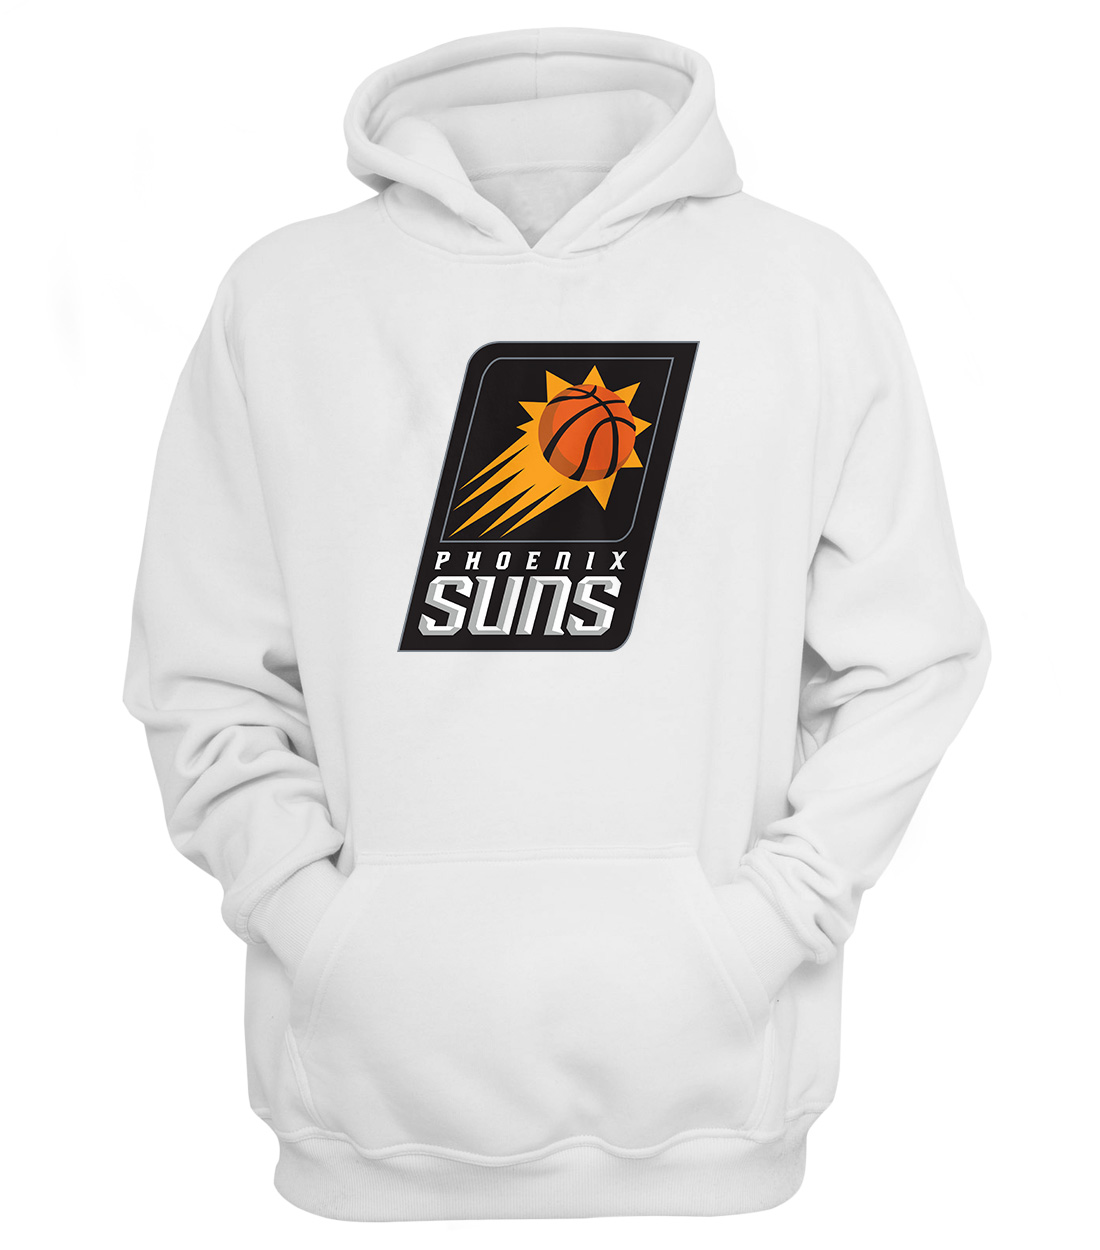 Phoenix Suns Hoodie (HD-WHT-NP-187-NBA-PHO-LOGO)